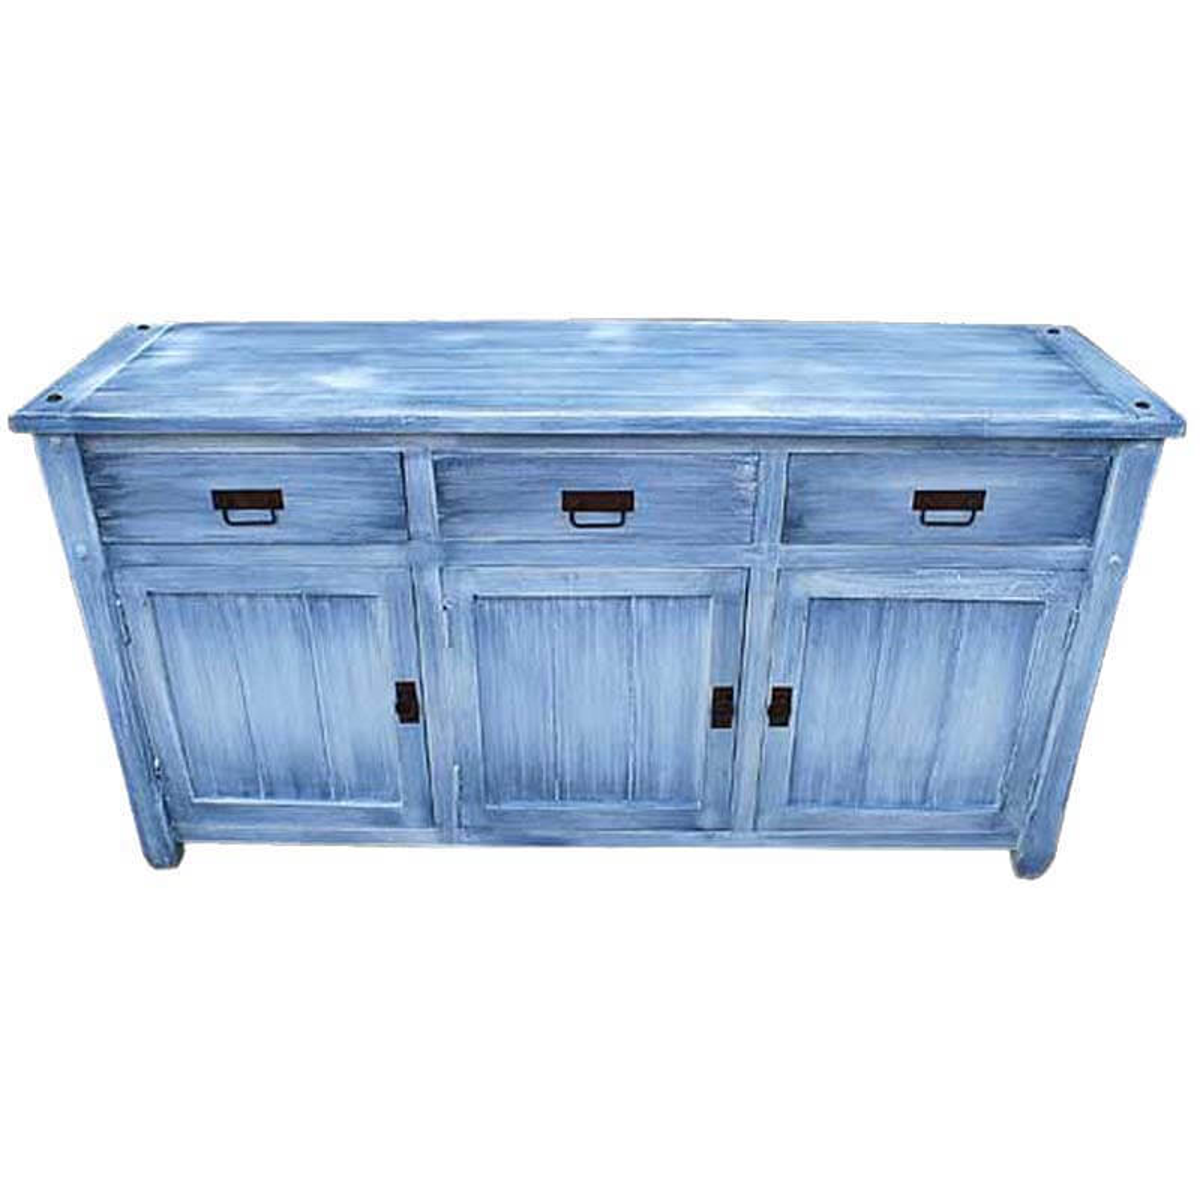 Appalachian Sky Blue Buffet Kitchen Cabinet Wood Sideboard Credenza - Sky Blue Buffet Kitchen Cabinet Wood Sideboard Credenza